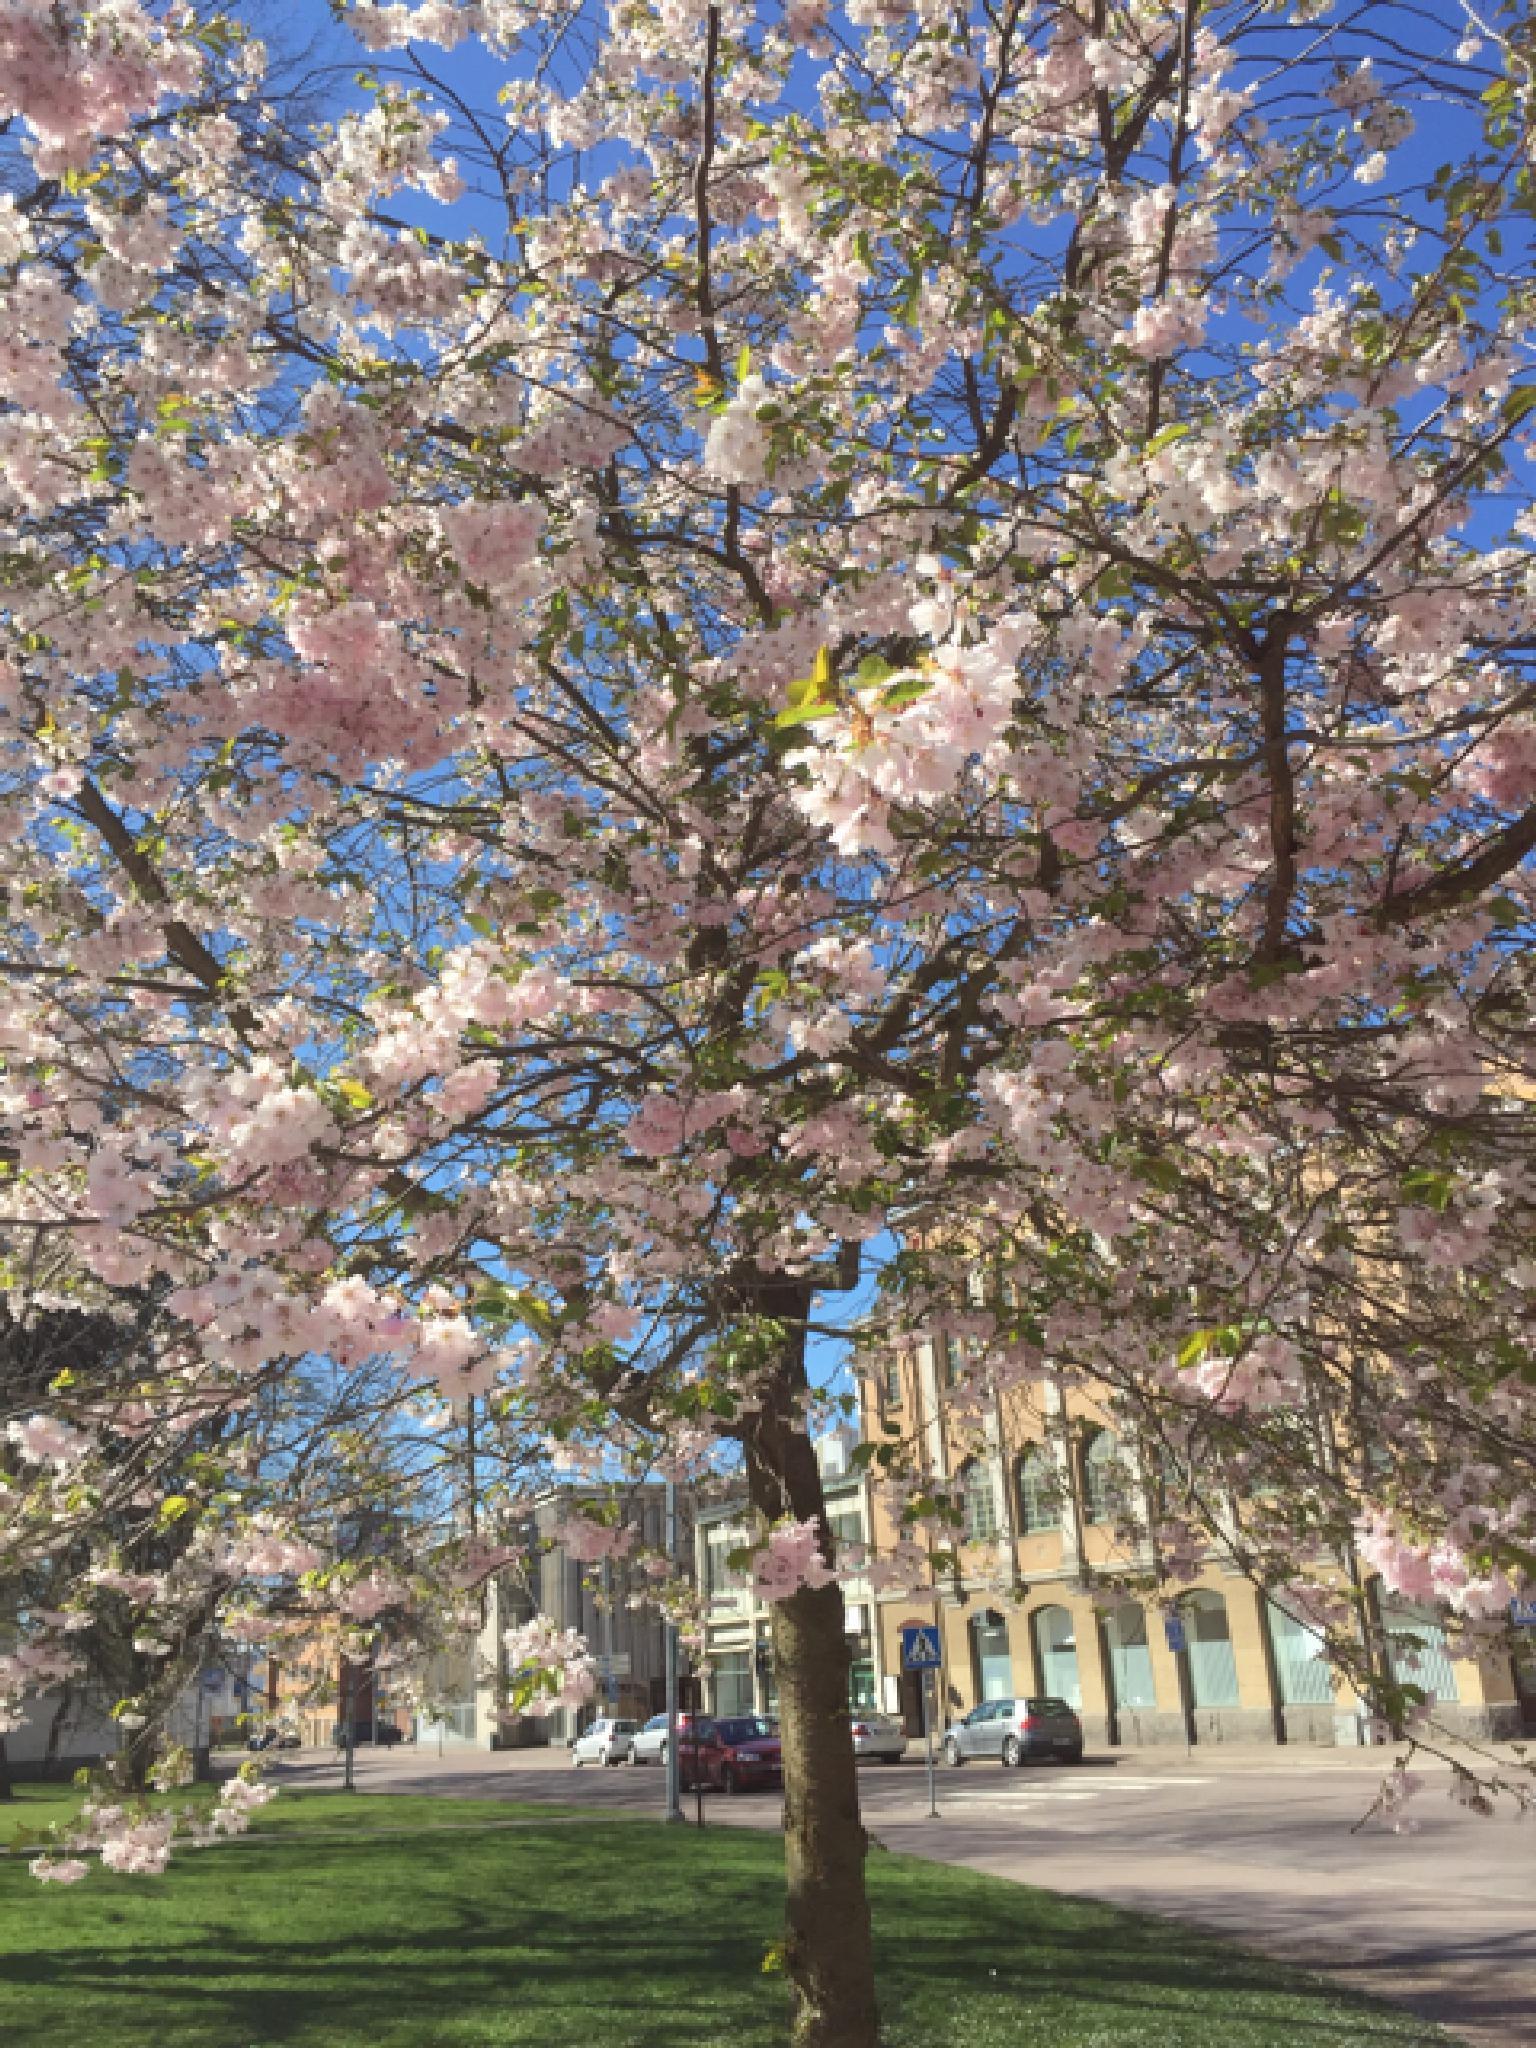 IMG_5172 by helene.renck.blom